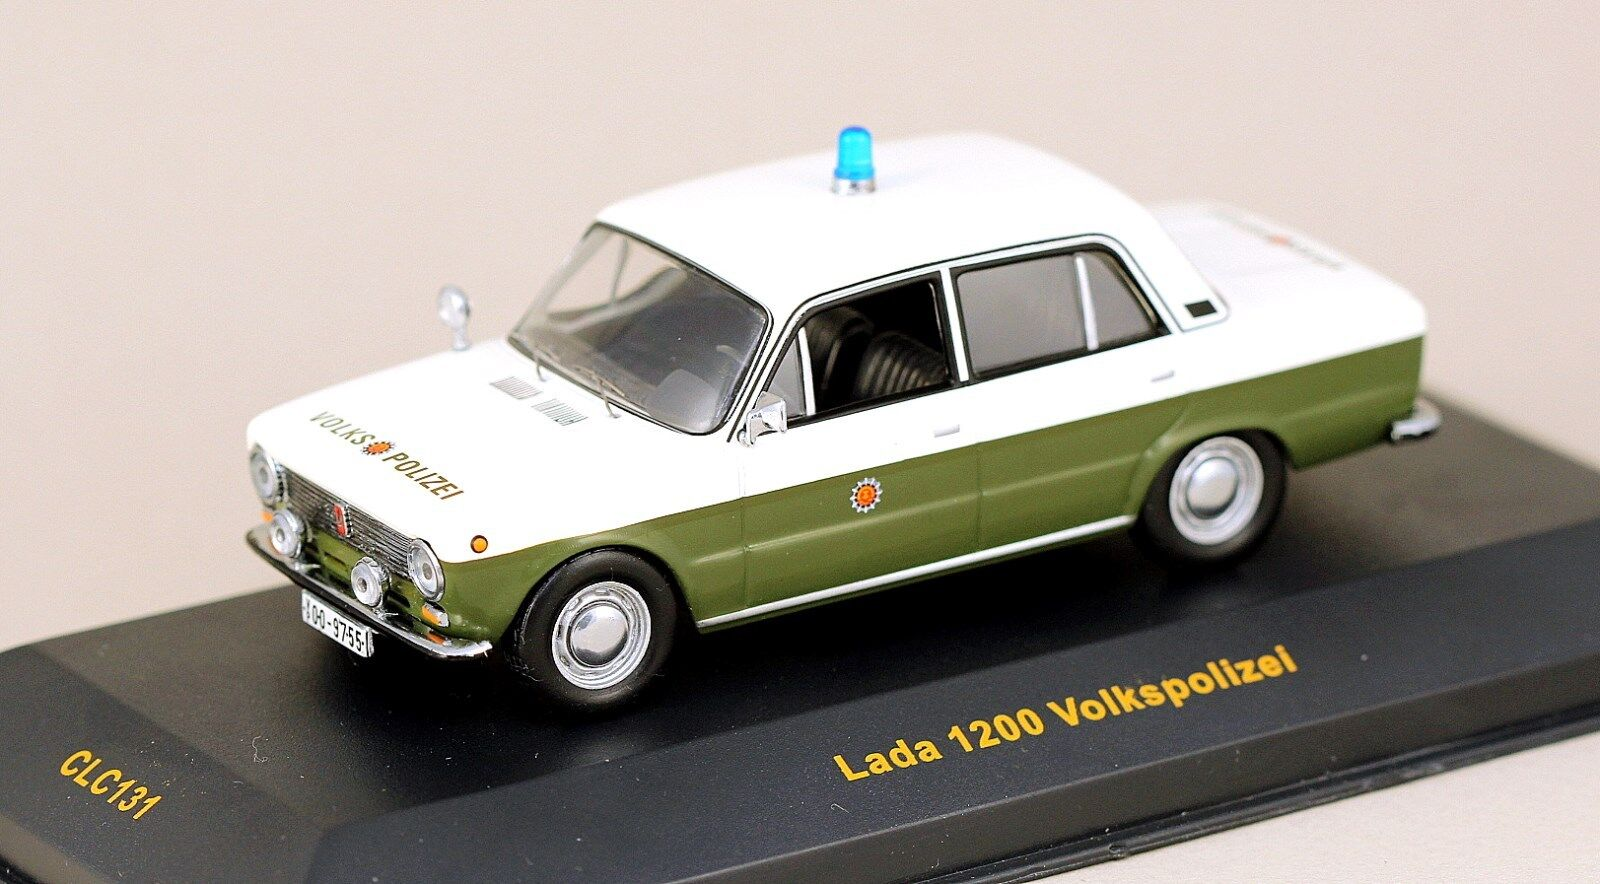 Échelle 1 43 IXO CLC131 Est-Allemand VAZ 2101 LADA Berline Volkspolizei Comme neuf IN BOX